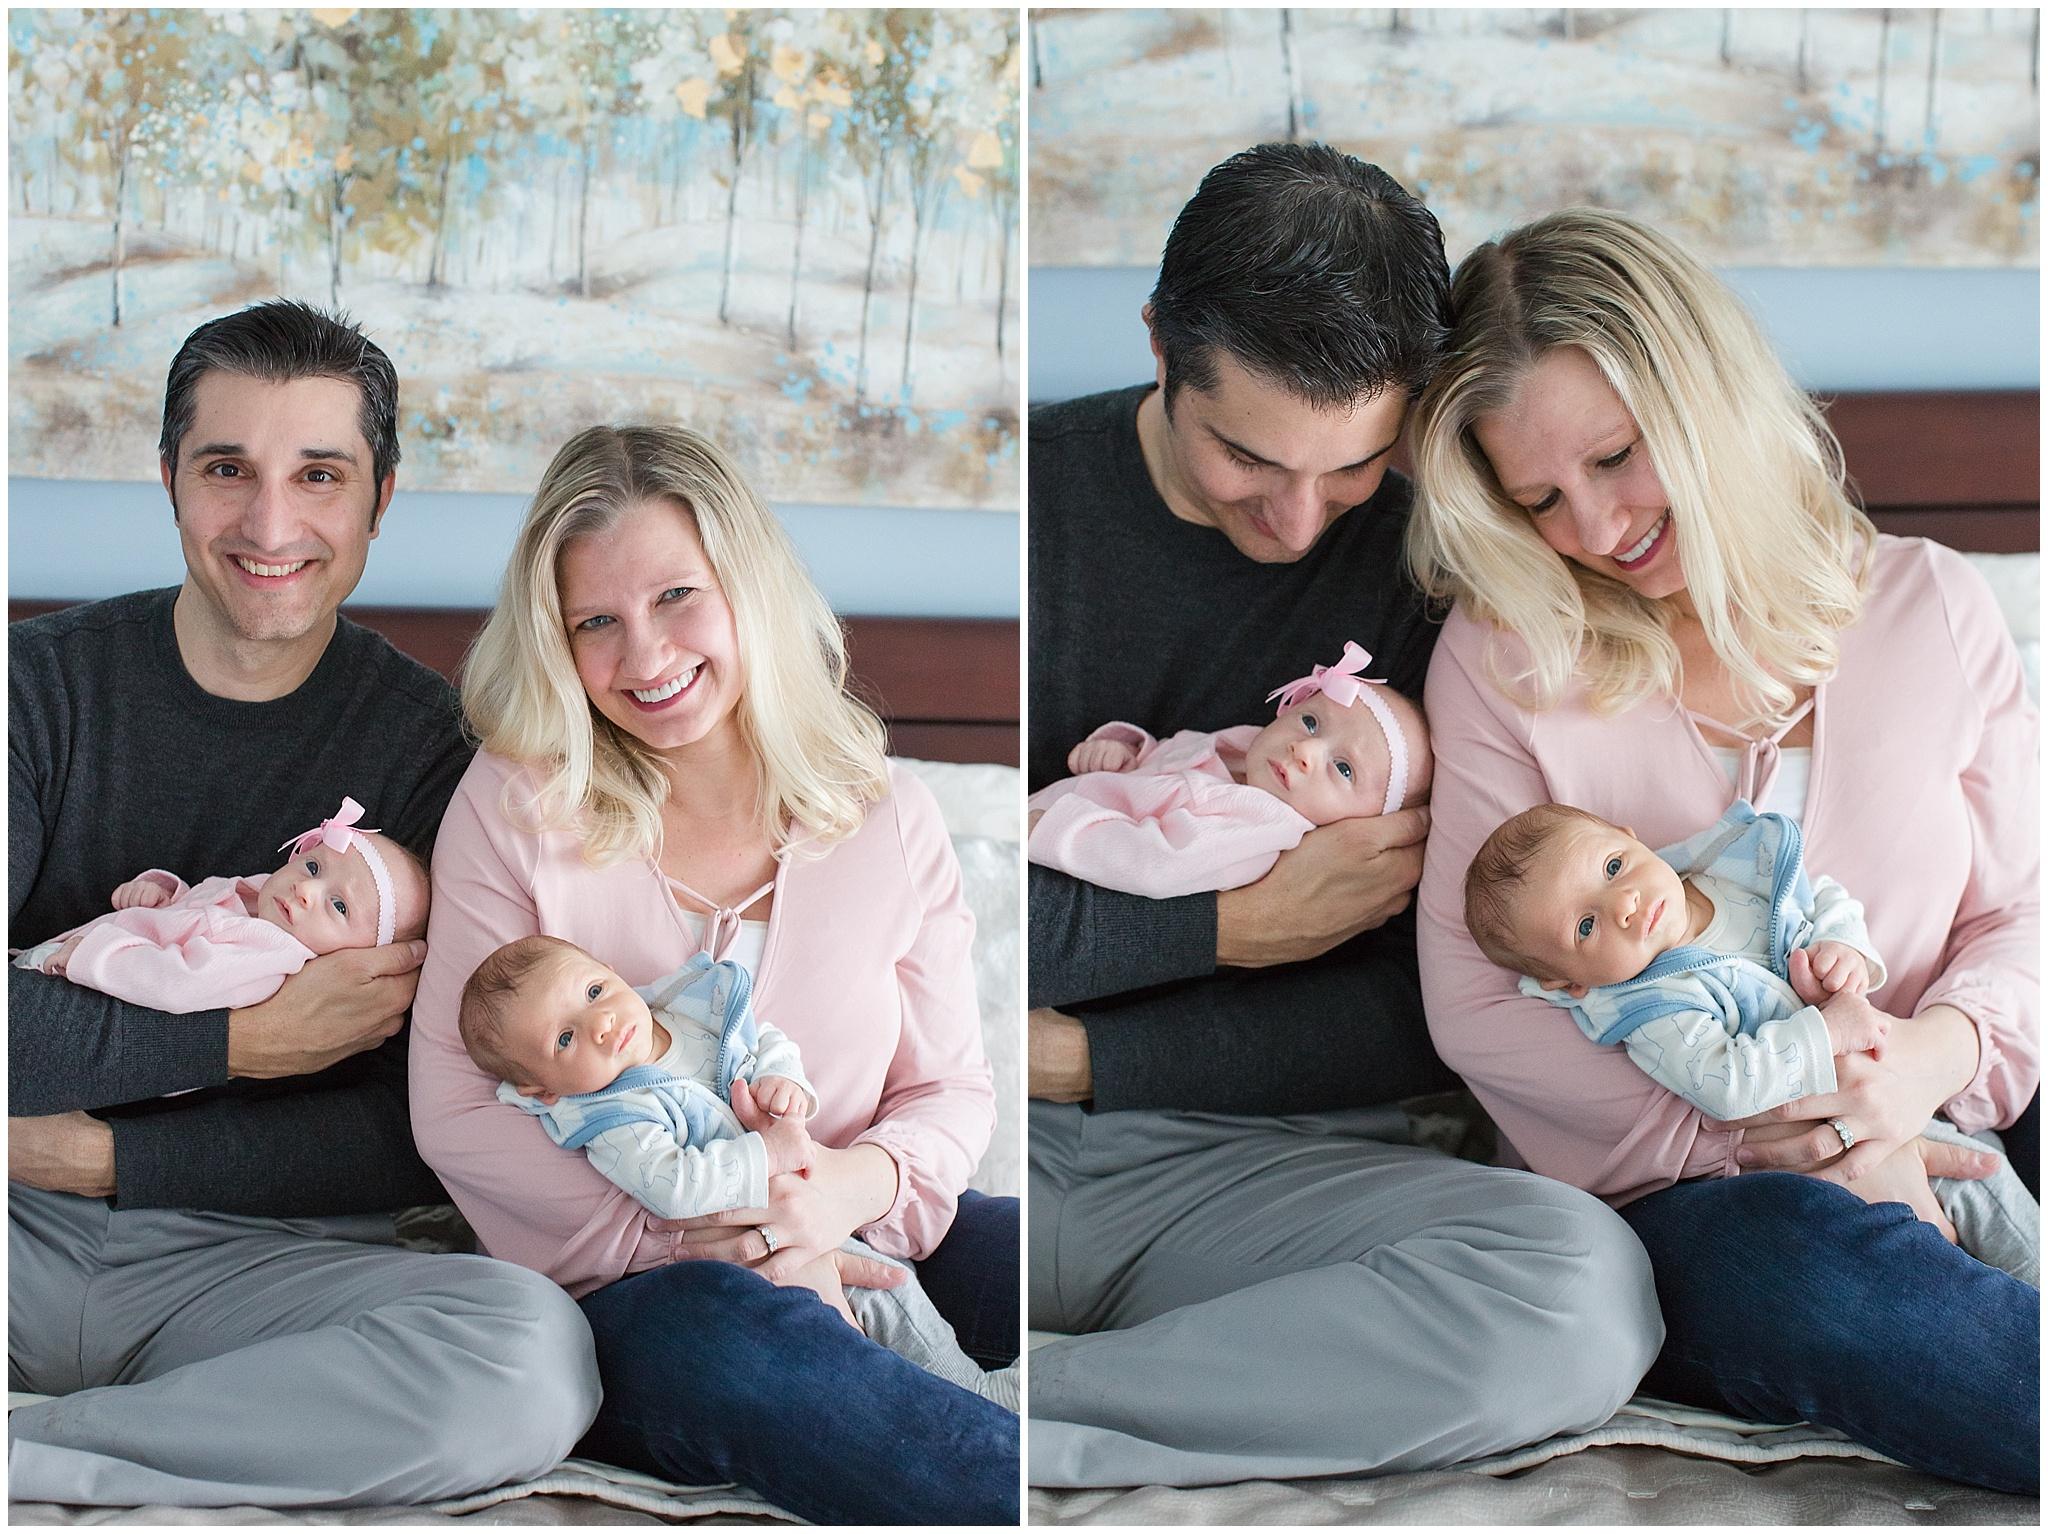 newborn_twins_photography_Gadgil_0006.jpg